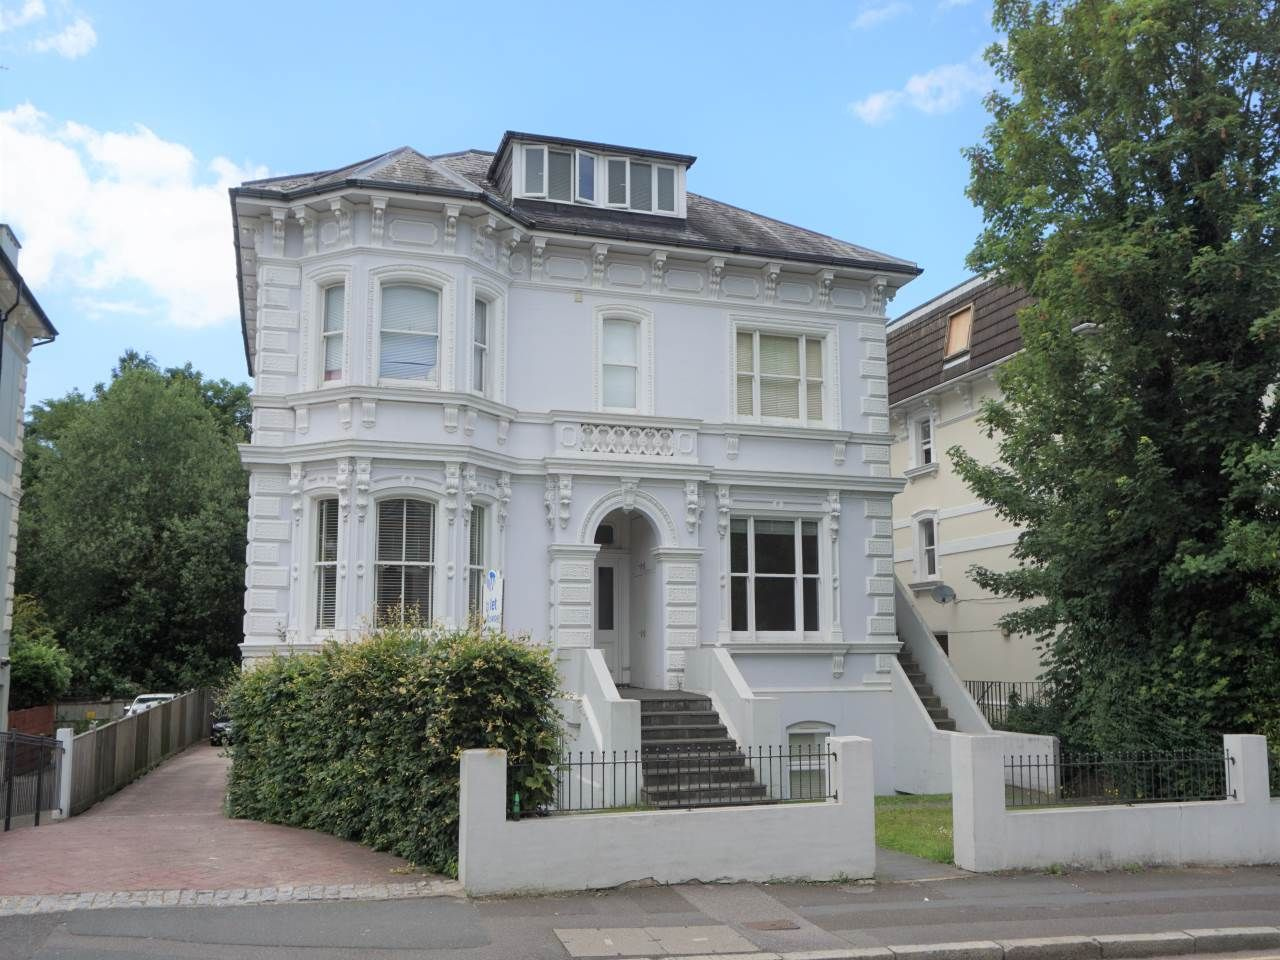 Property photo 1 of 6. Upper Grosvenor Road, 43 (2)